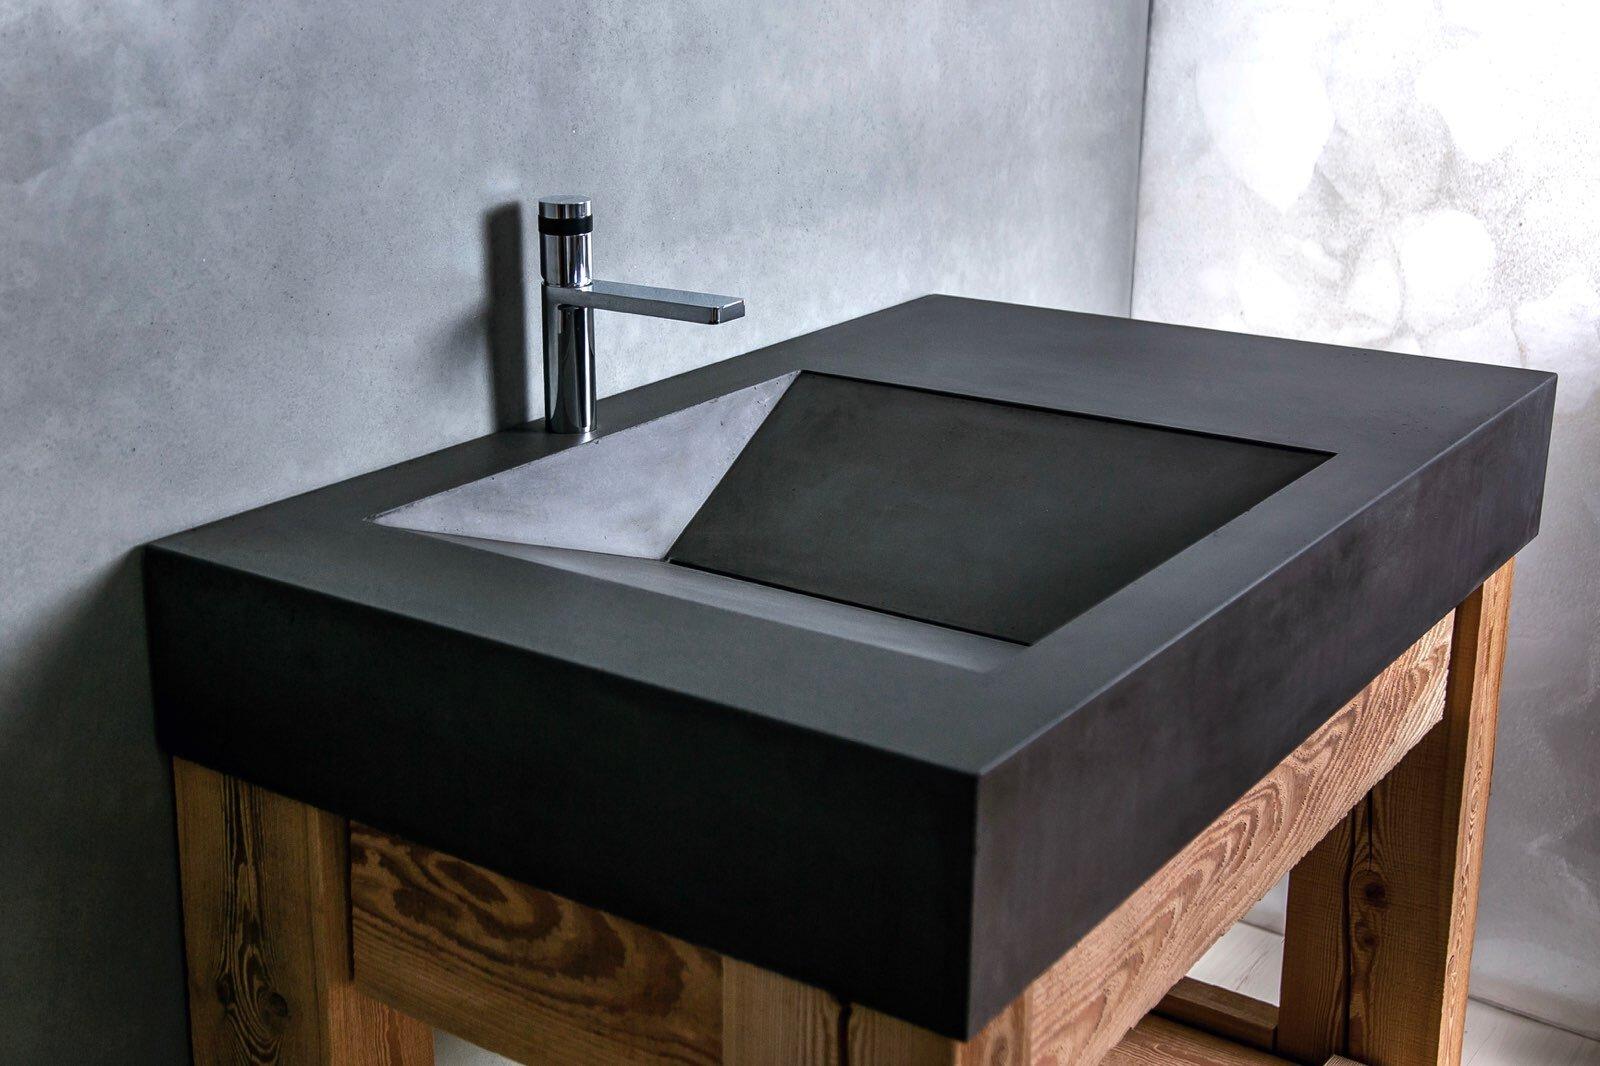 concrete sinks woven 3 design